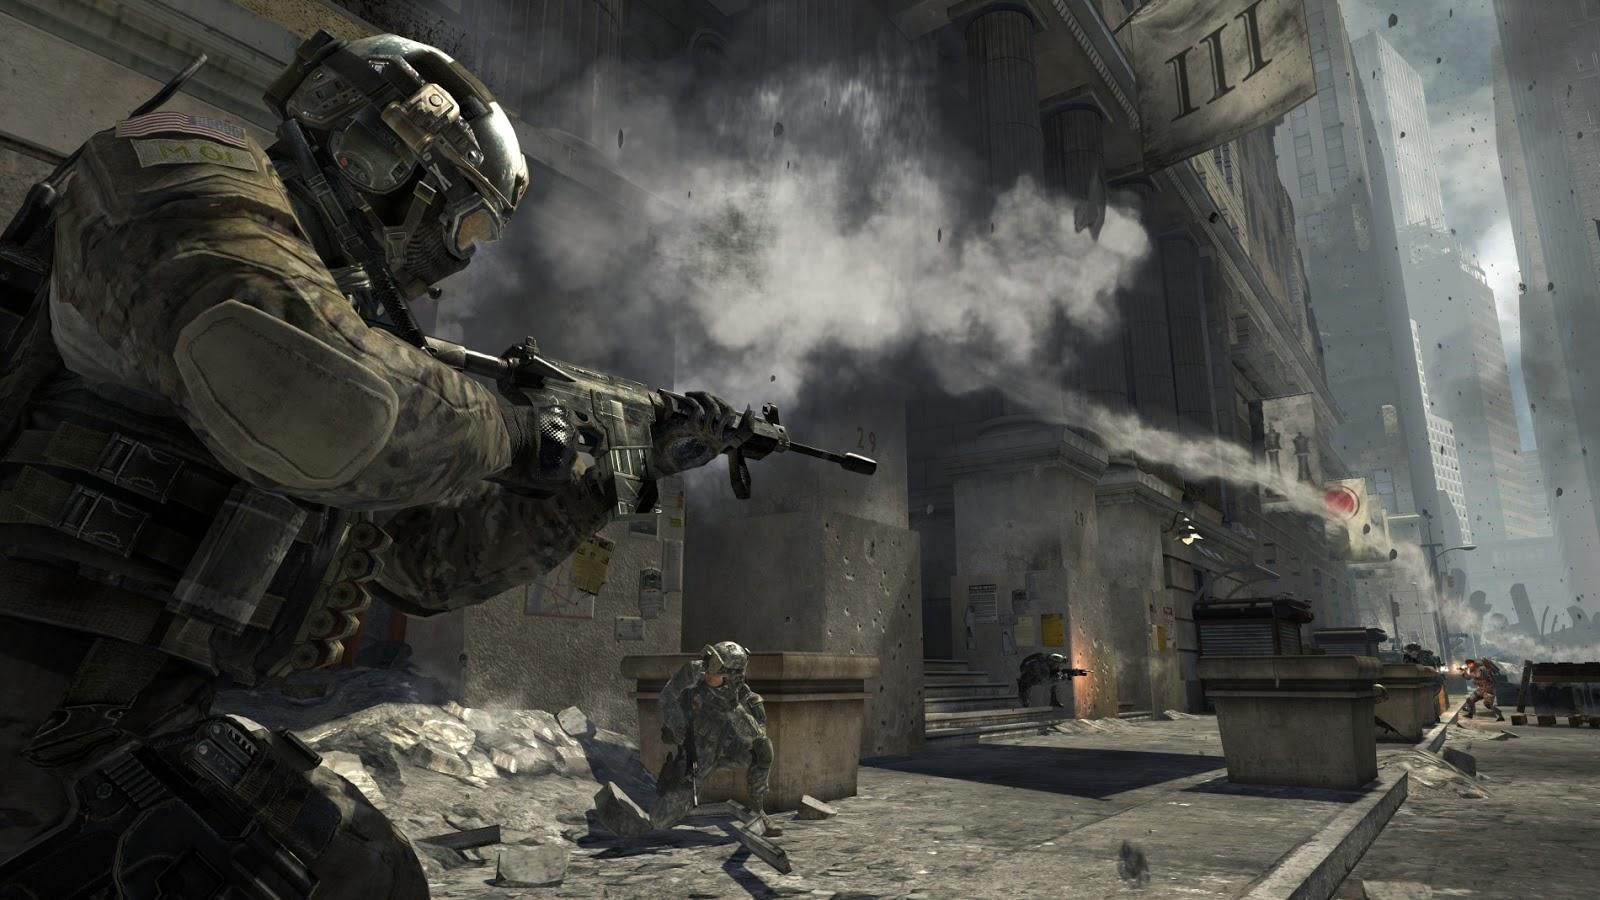 Call Of Duty Modern Warfare 3 Firestone